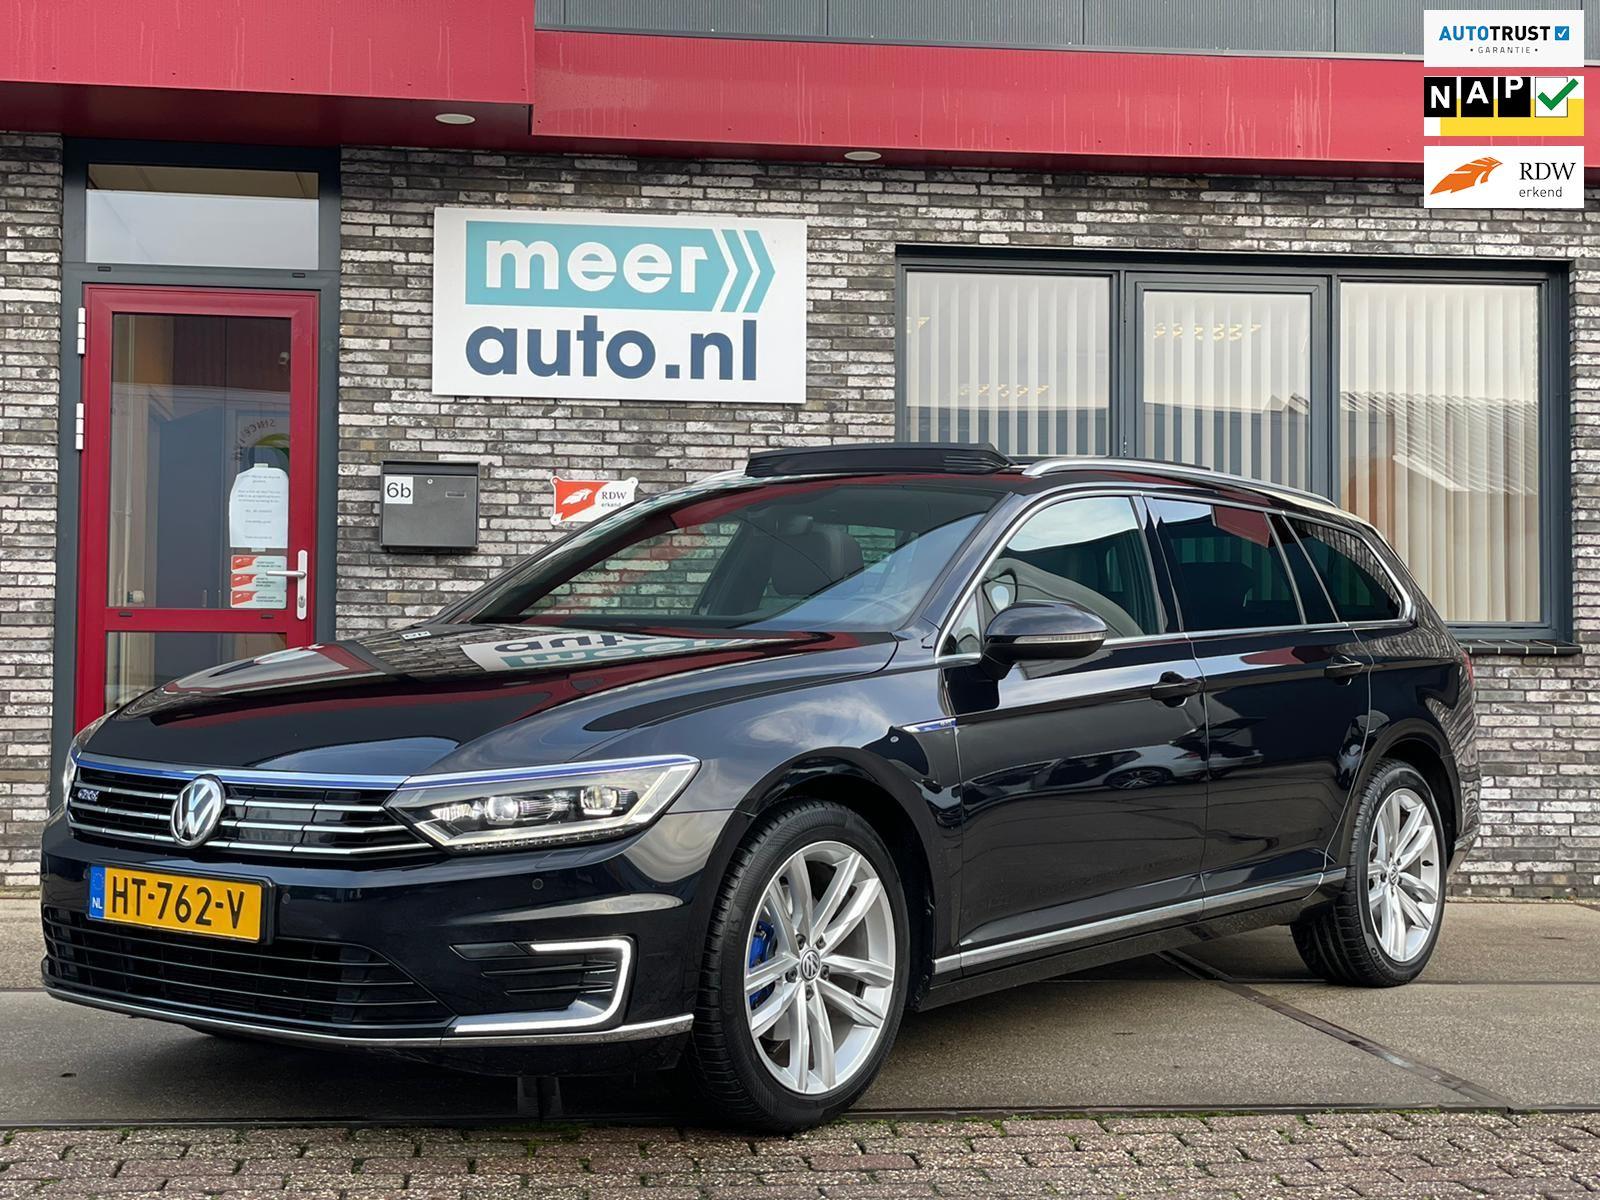 Volkswagen Passat Variant occasion - Meerauto.nl